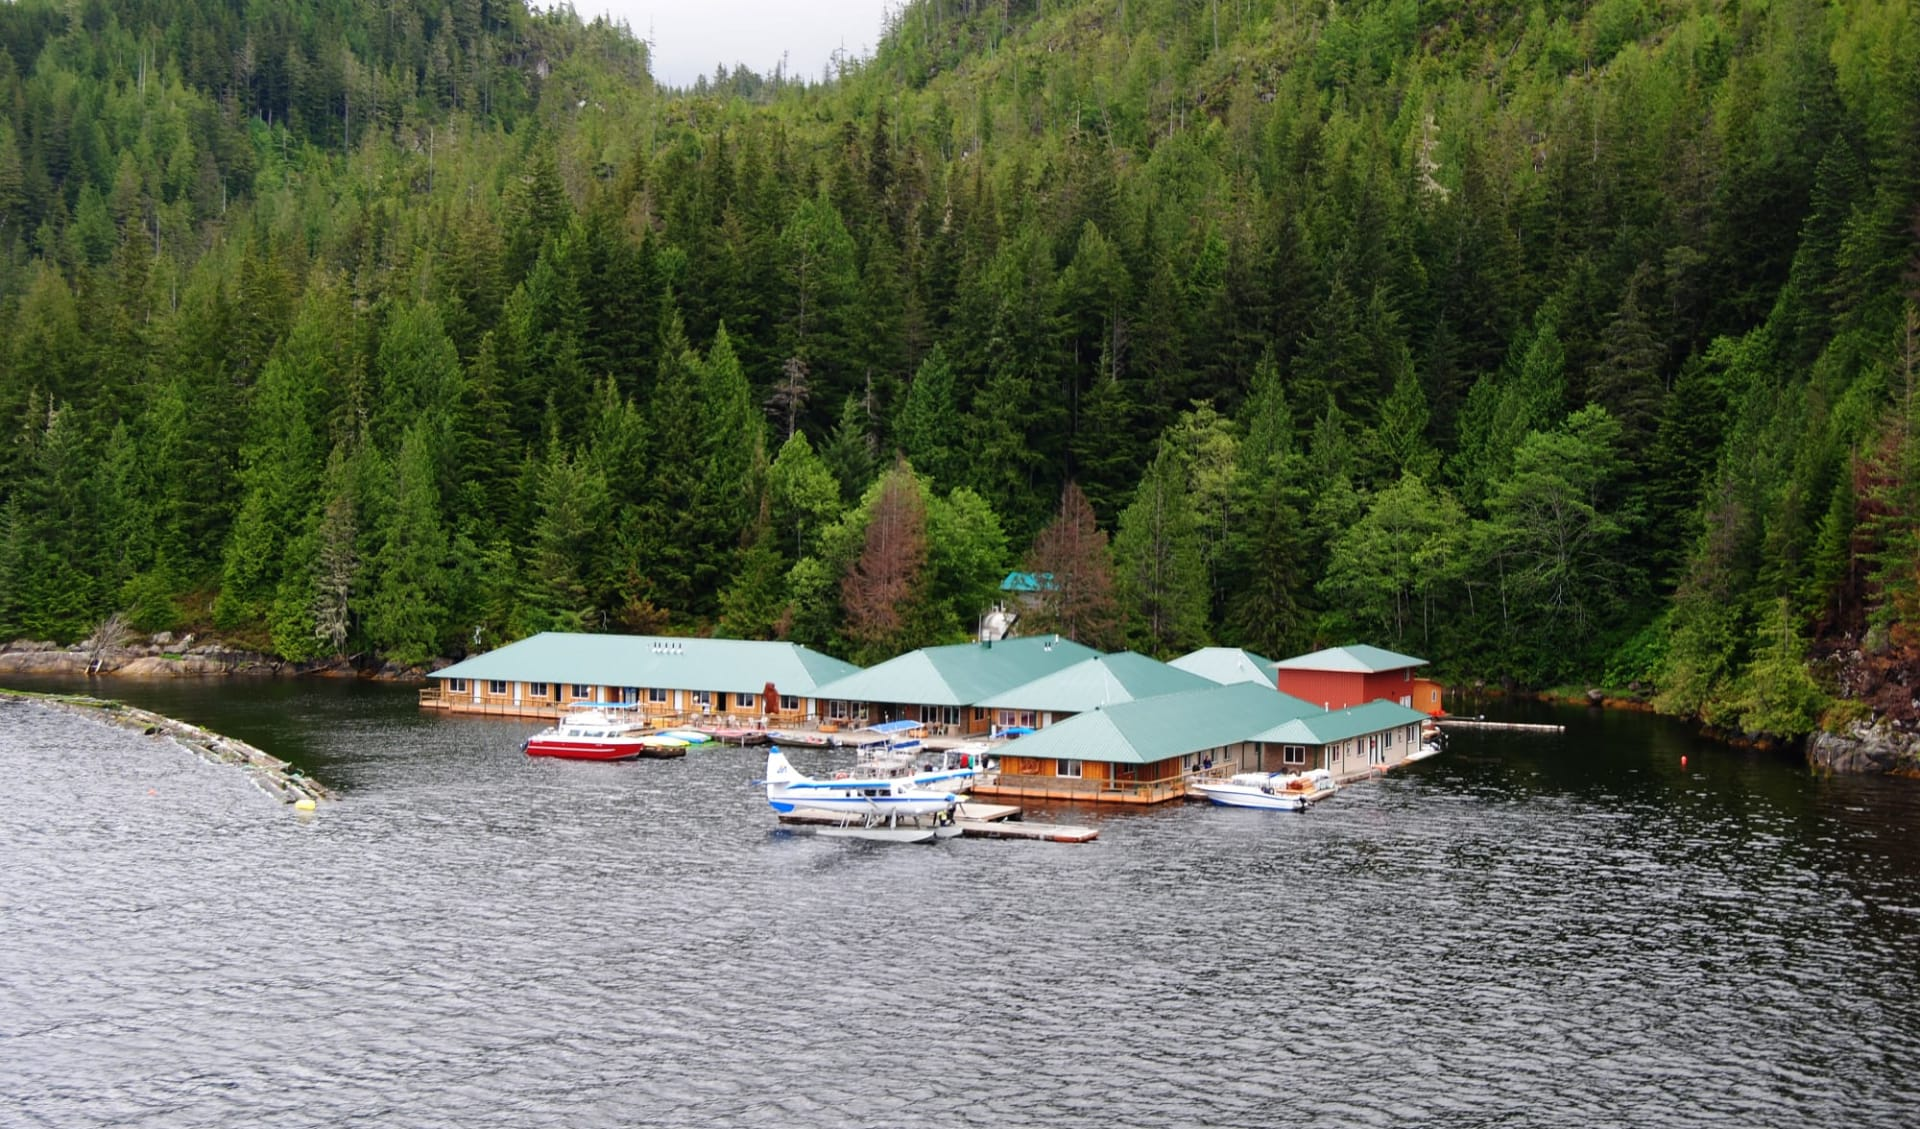 Bärenbeobachtung Knight Inlet Lodge 4 Tage ab Campbell River: exterior: Knight Inlet Lodge - Lodge von aussen